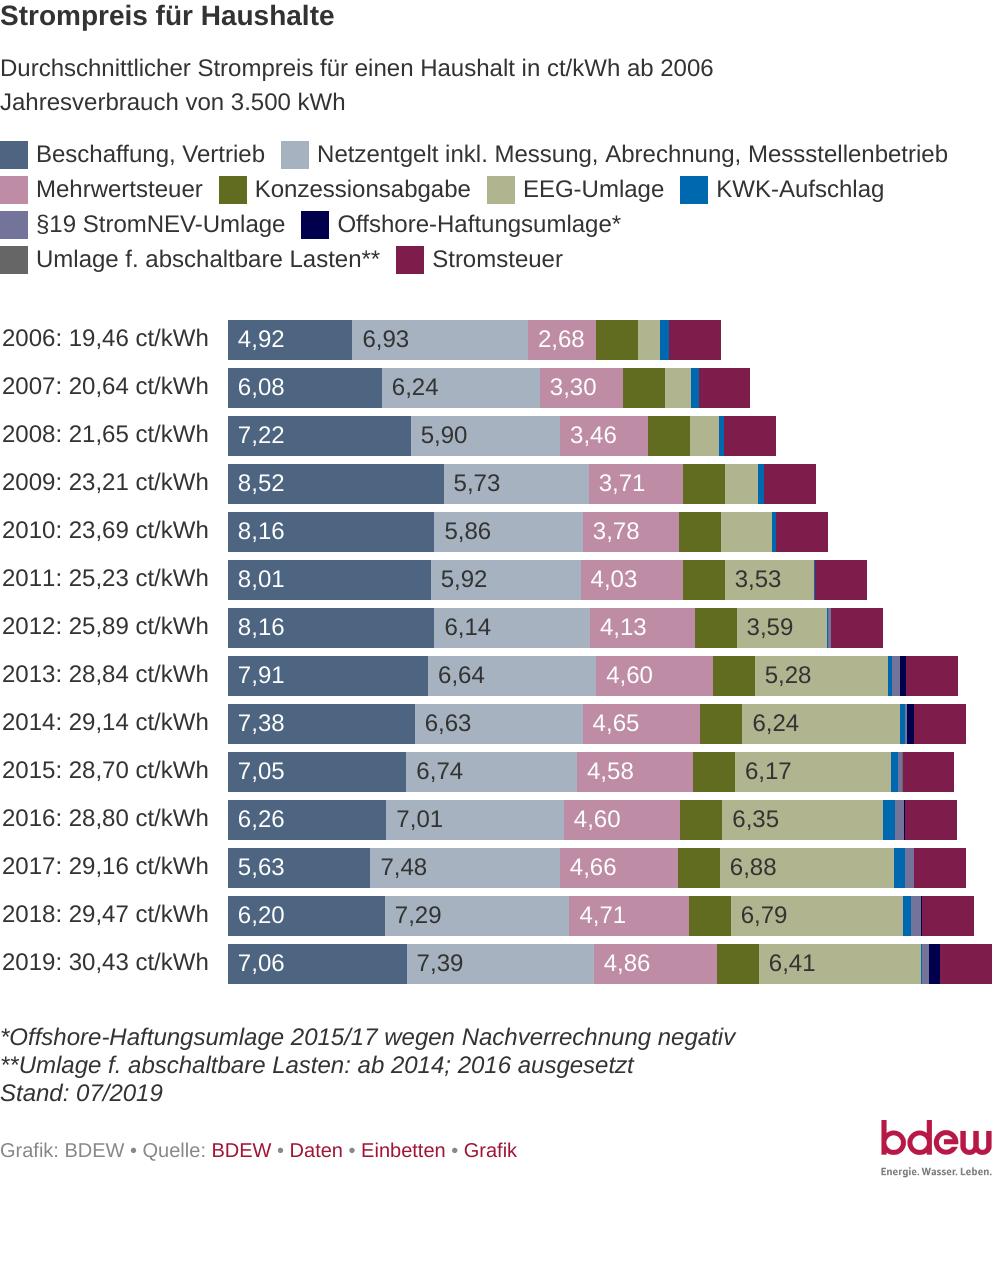 https://img.datawrapper.de/UZFJF/full.png